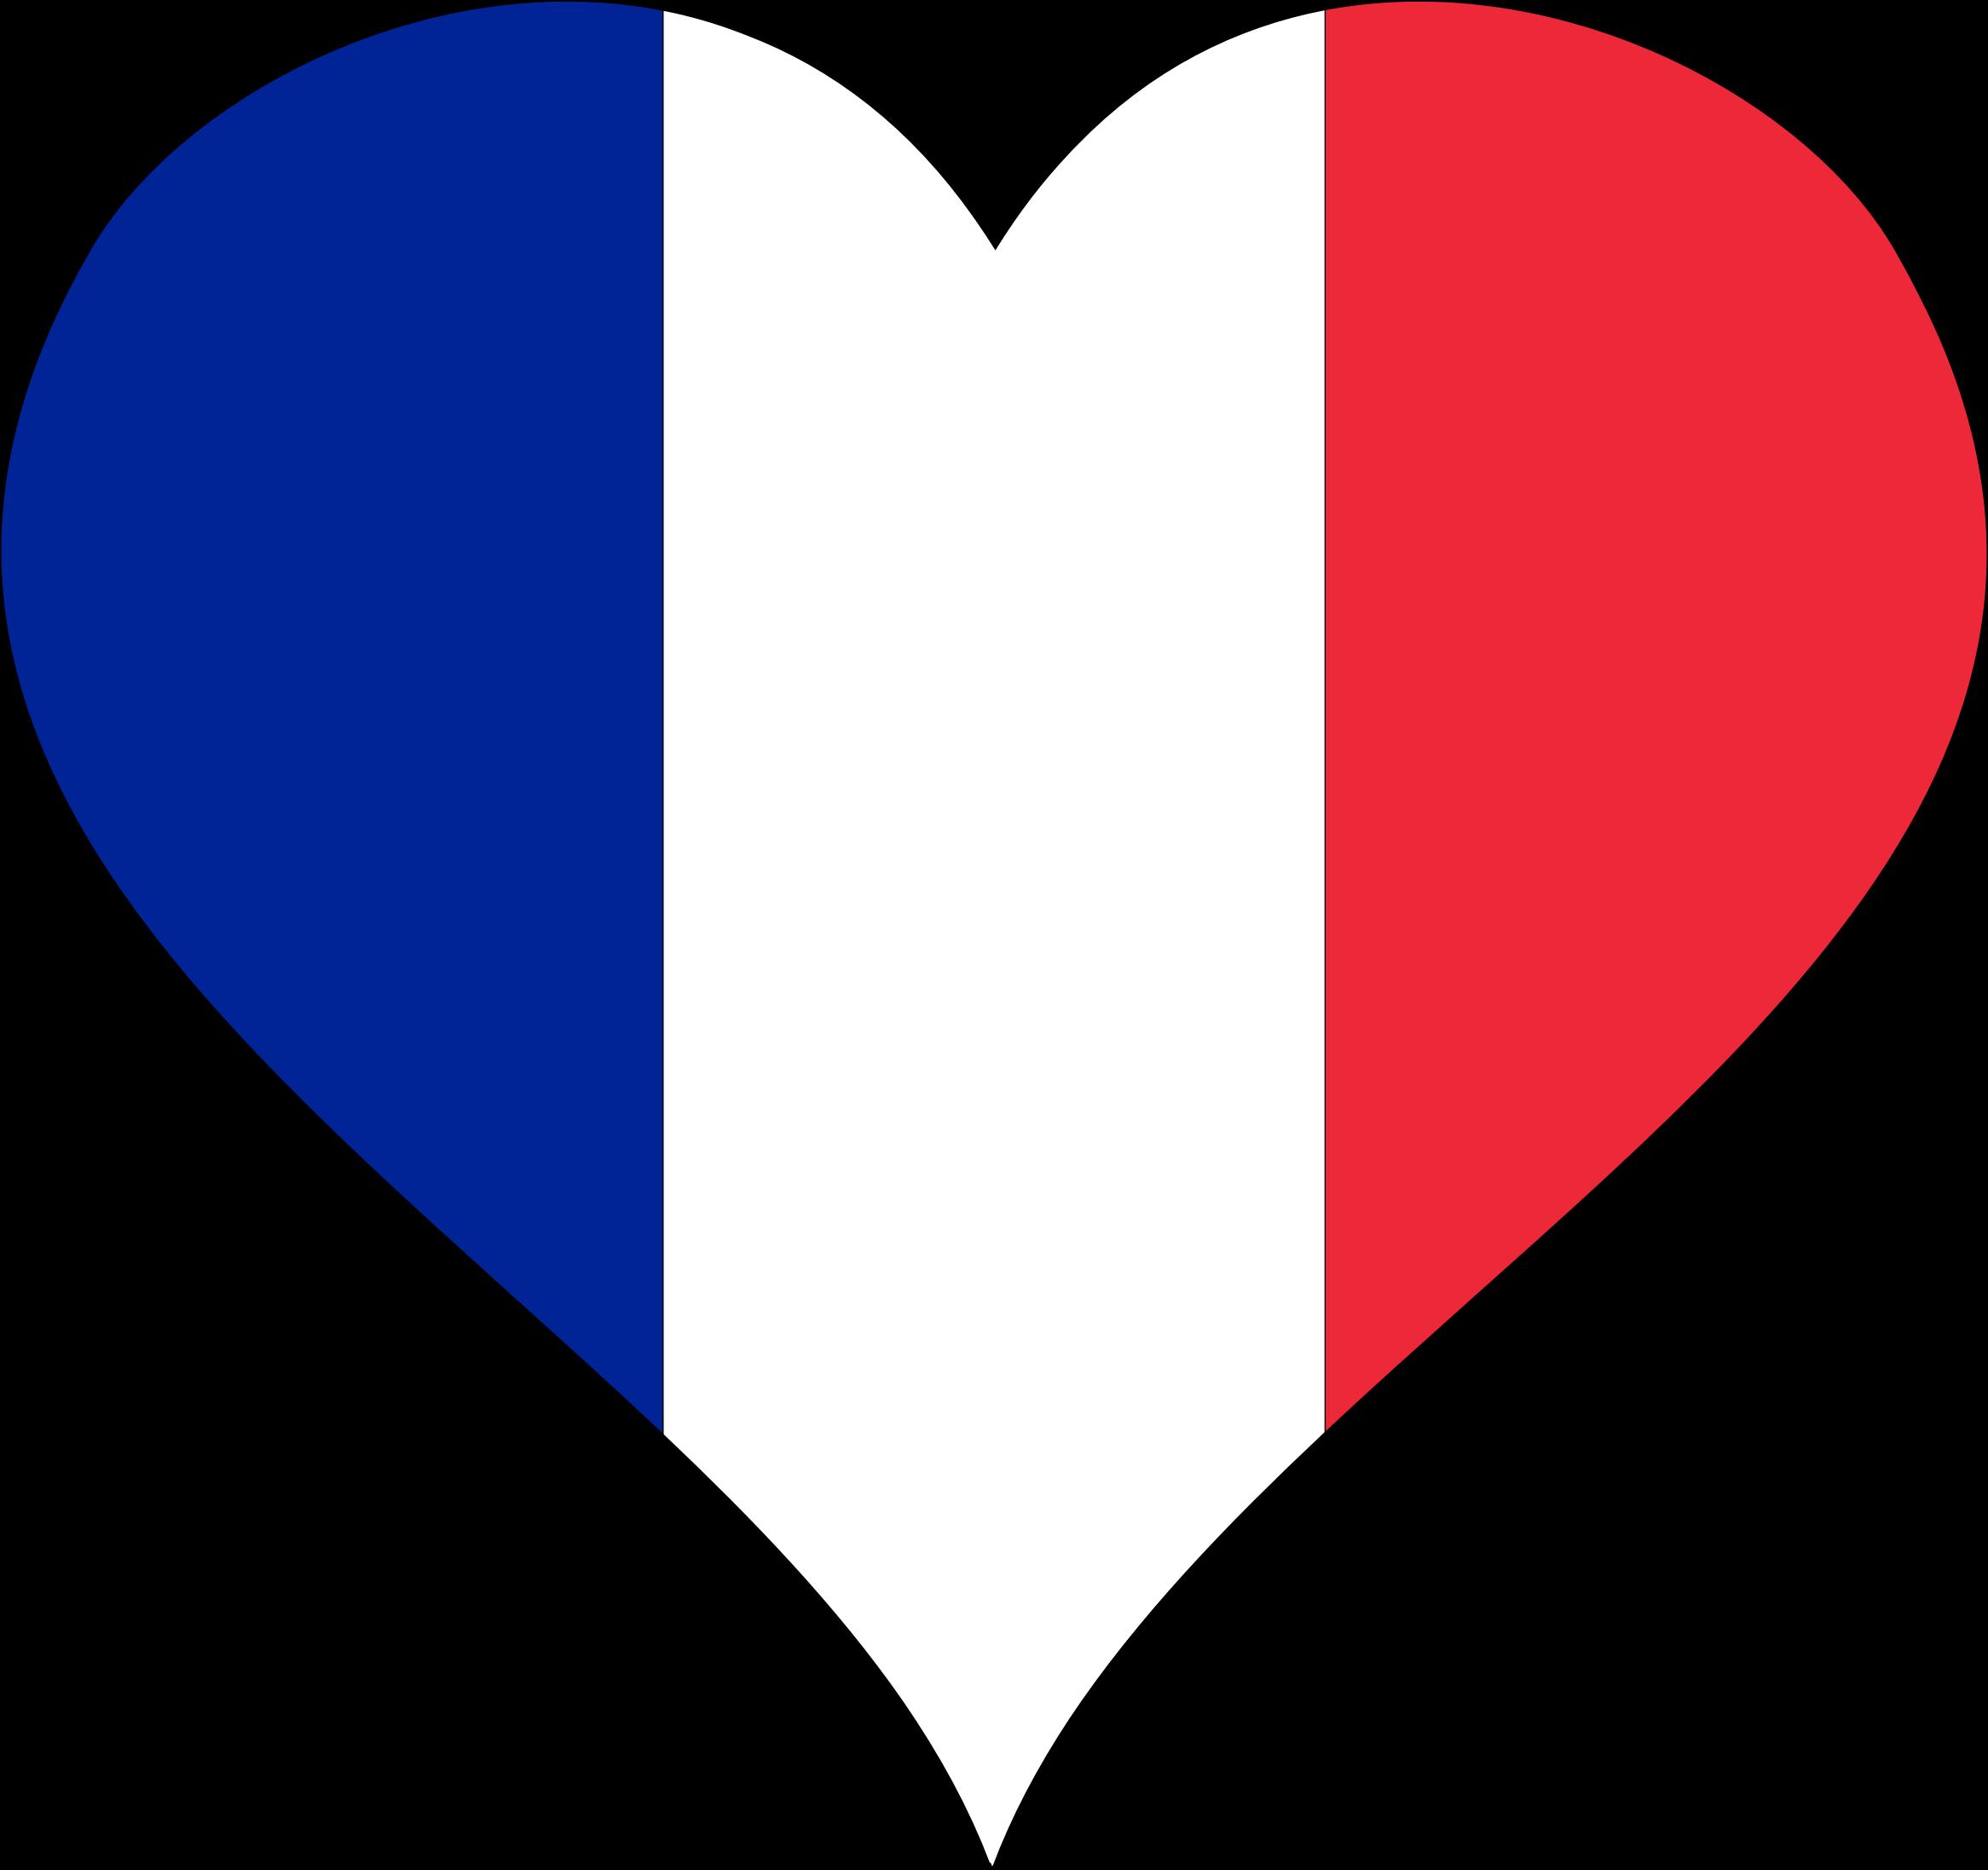 We Heart France